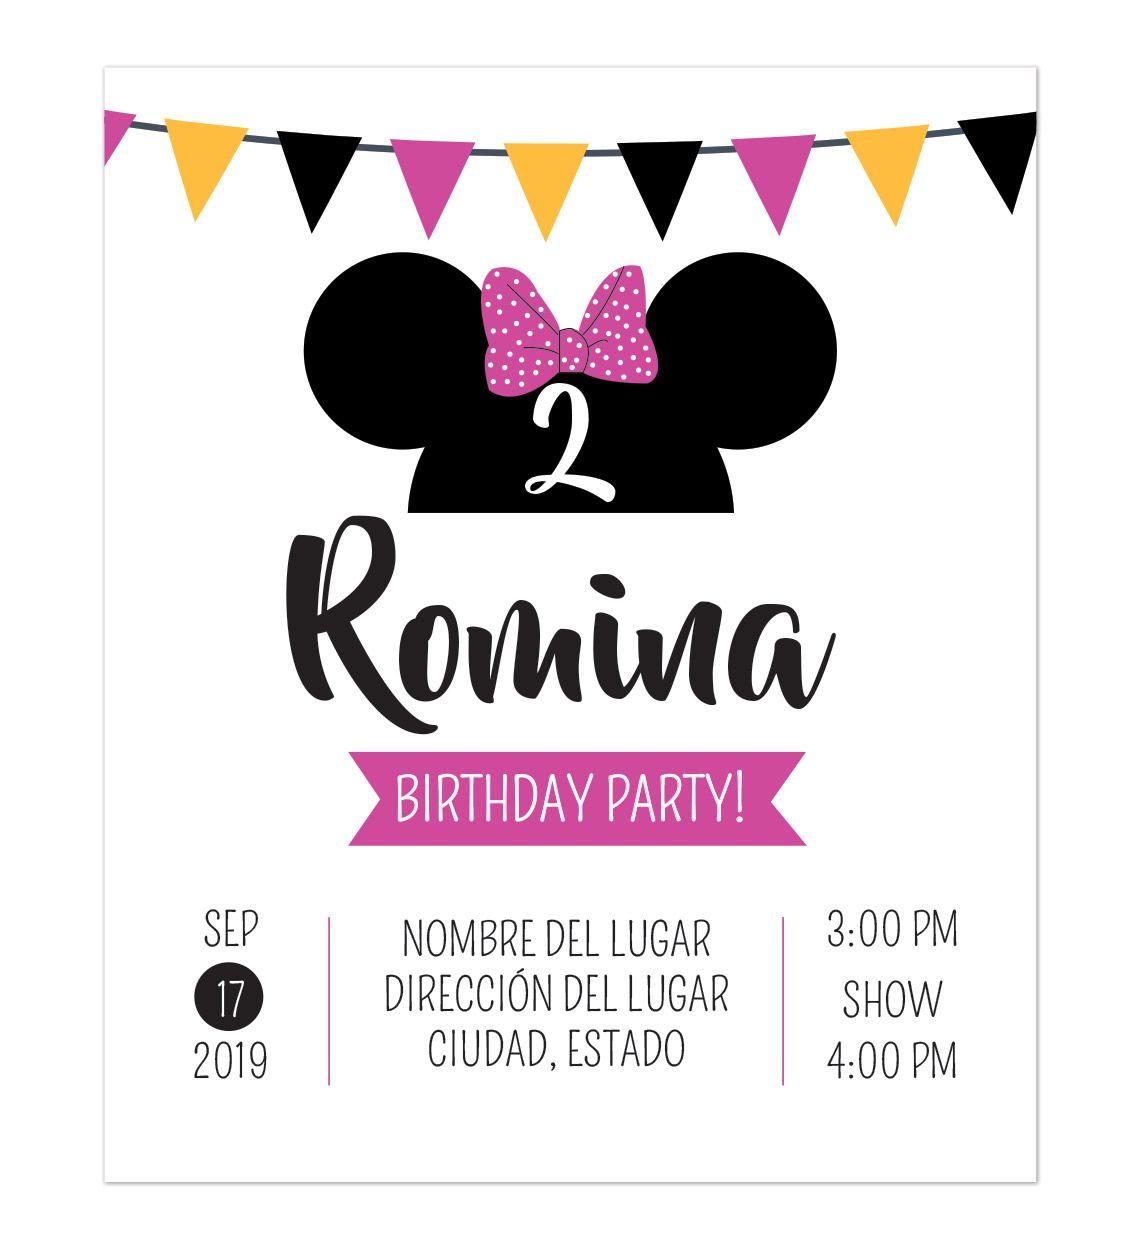 Invitación Cumpleaños Minnie Fiesta Cumpleaños Minnie